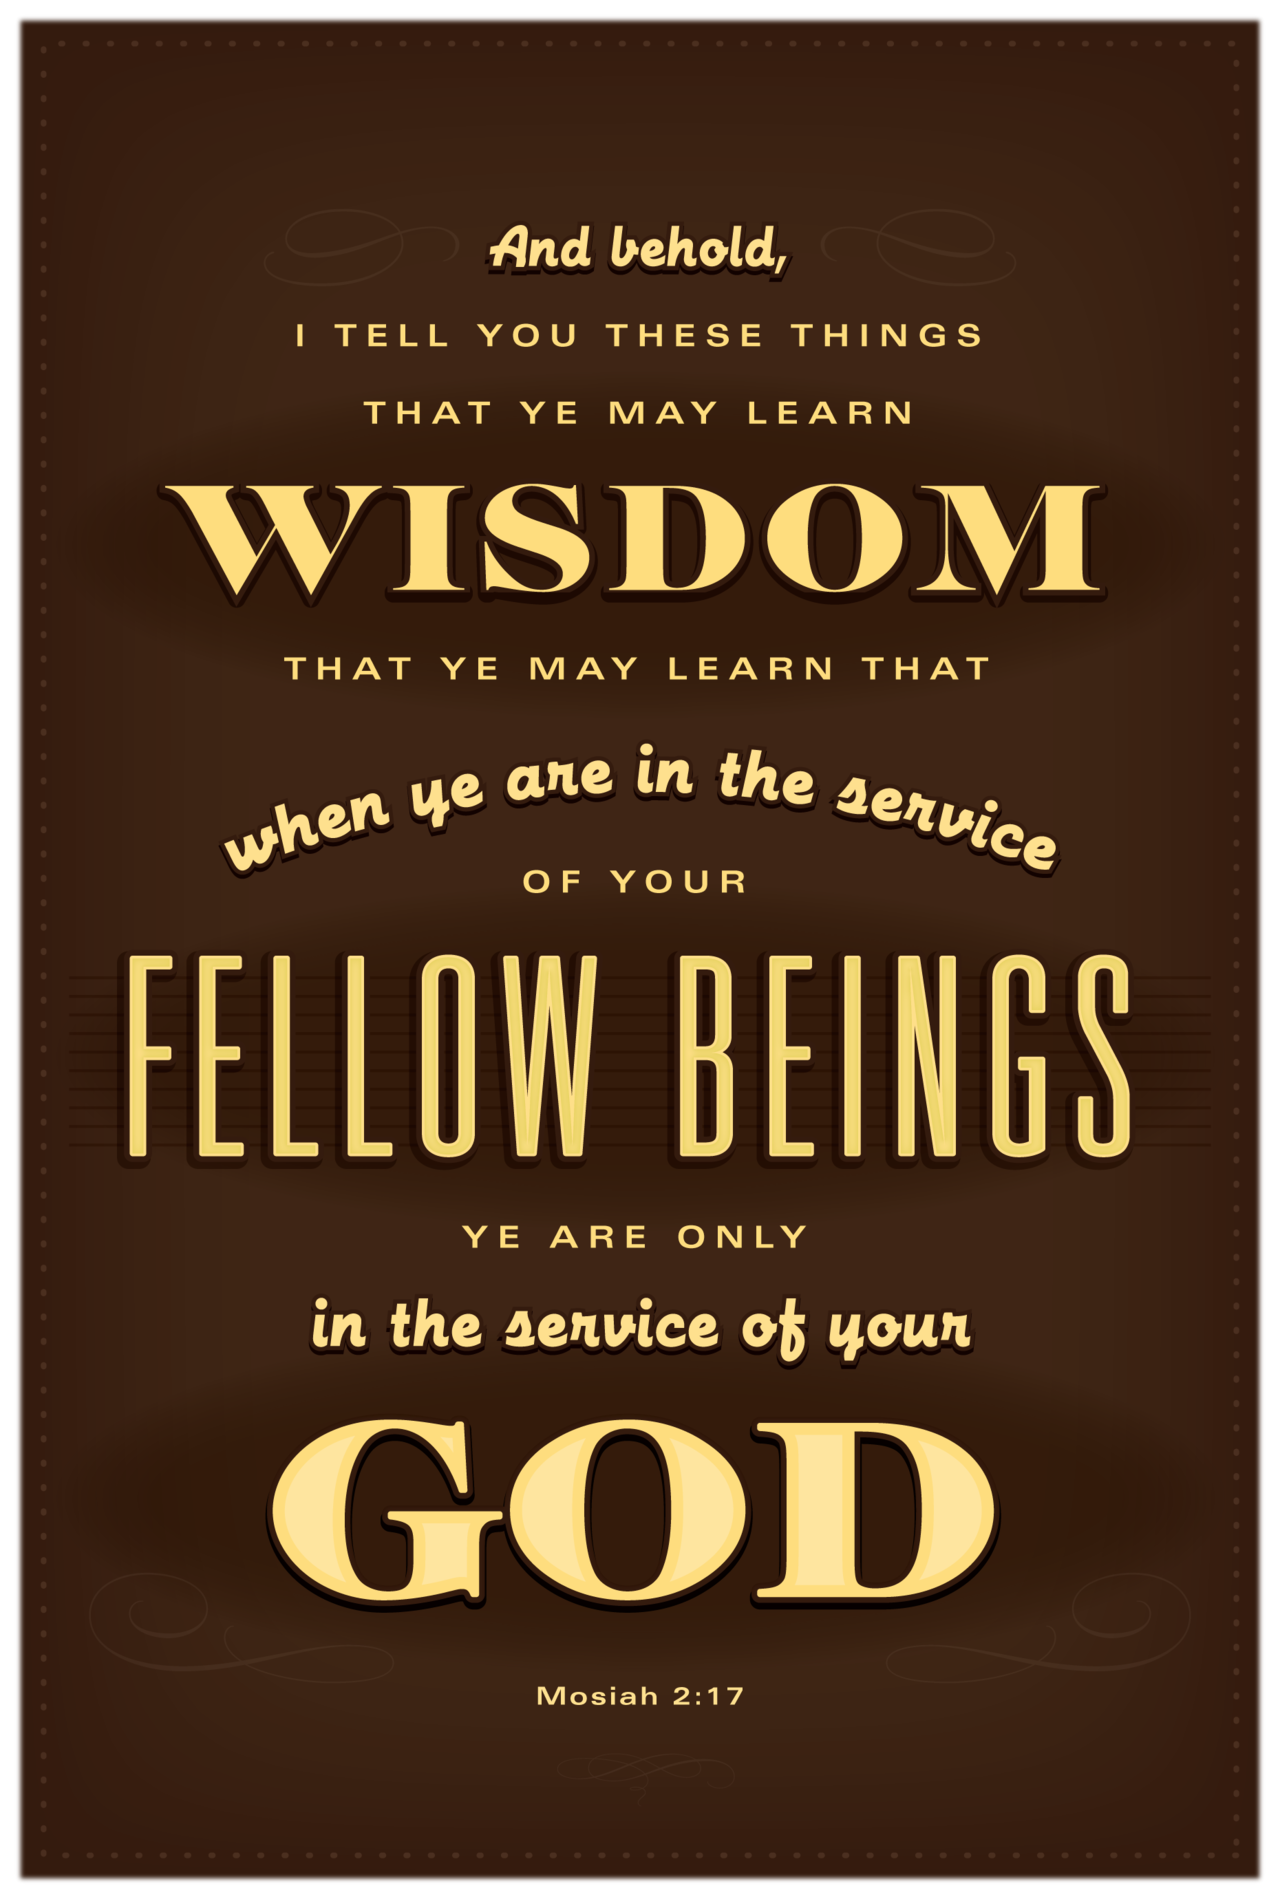 Wisdom Quotes Bible Mosiah 2 17  Monthly Scripture  Pinterest  Scriptures Wisdom